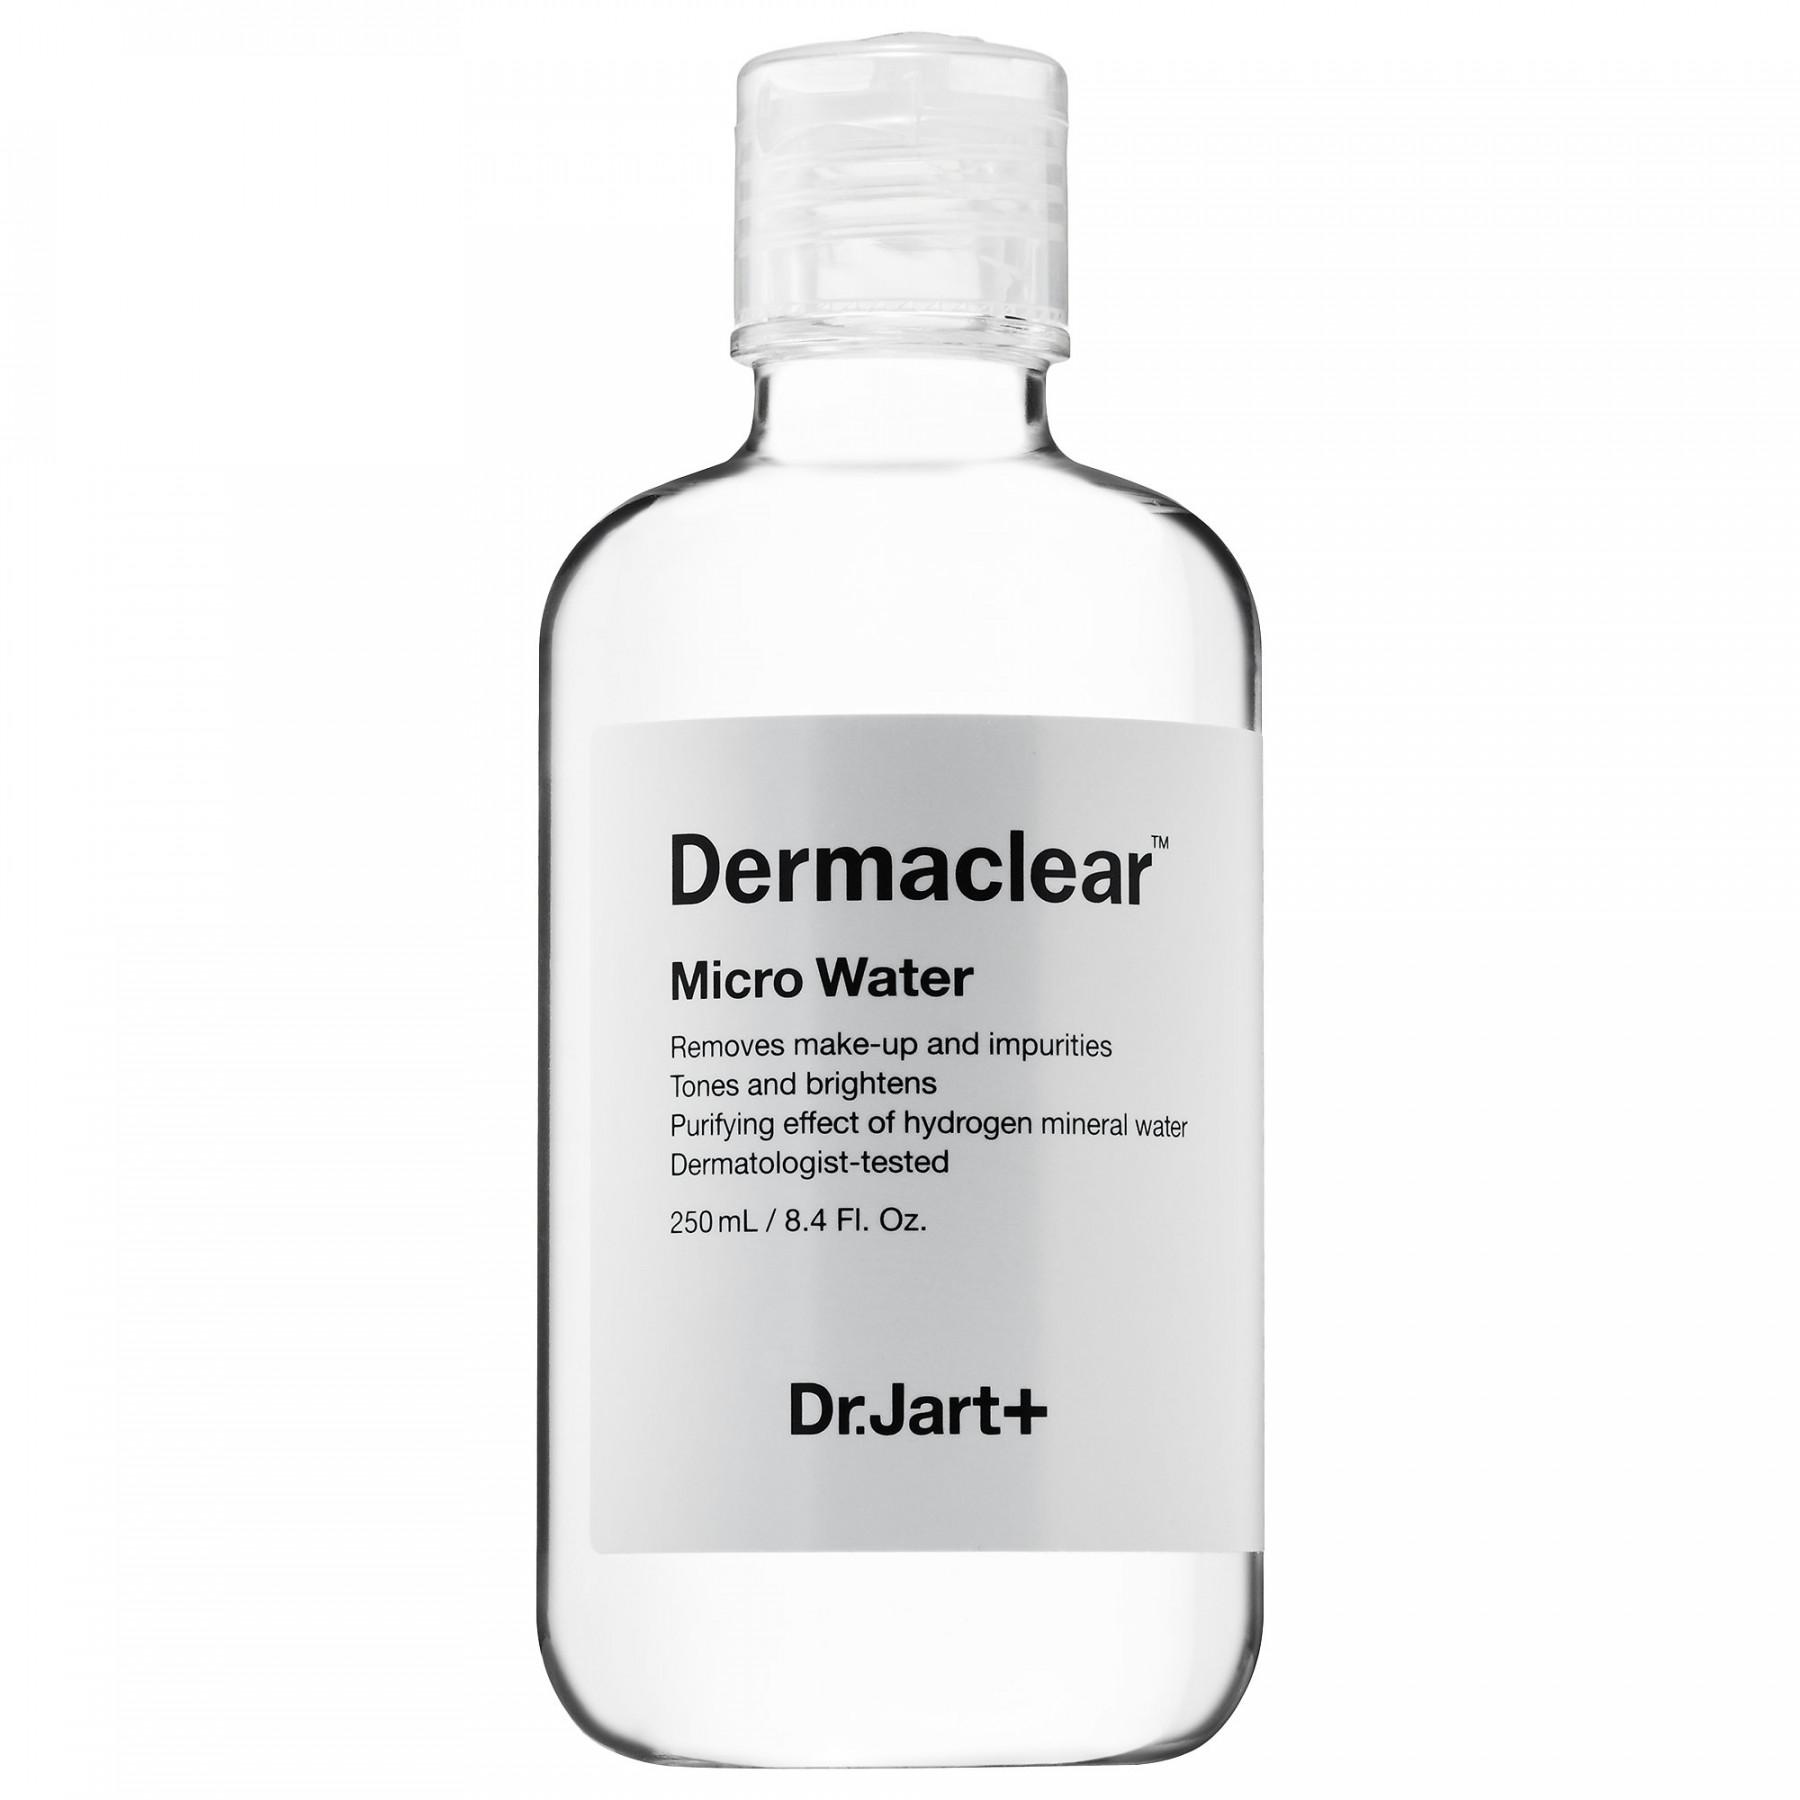 Dr. jart dermaclear microwater